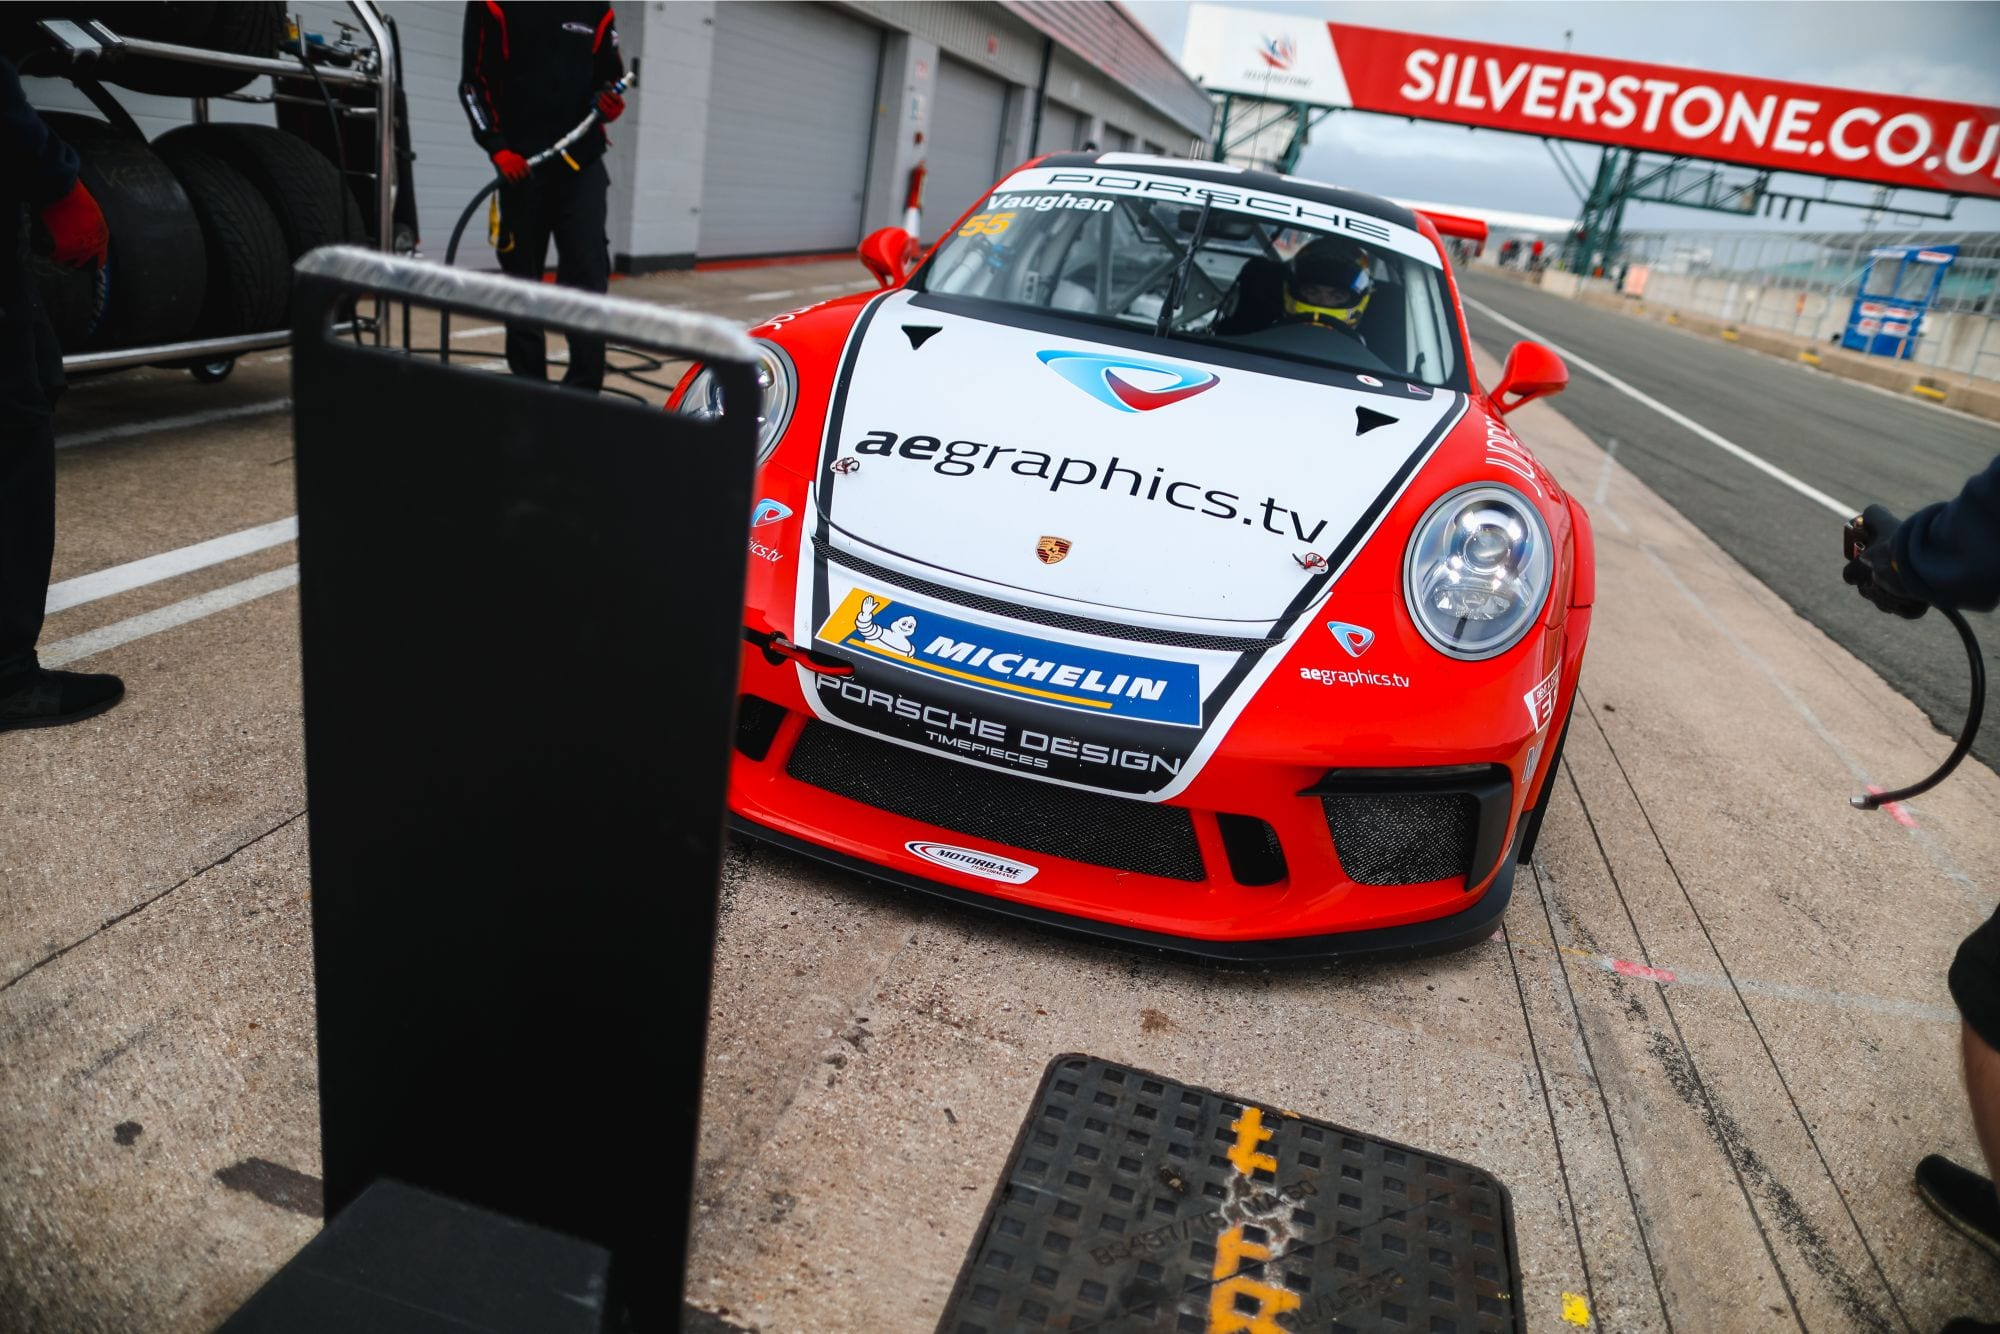 motorbase performance porsche carrera cup gb 2019 silverstone